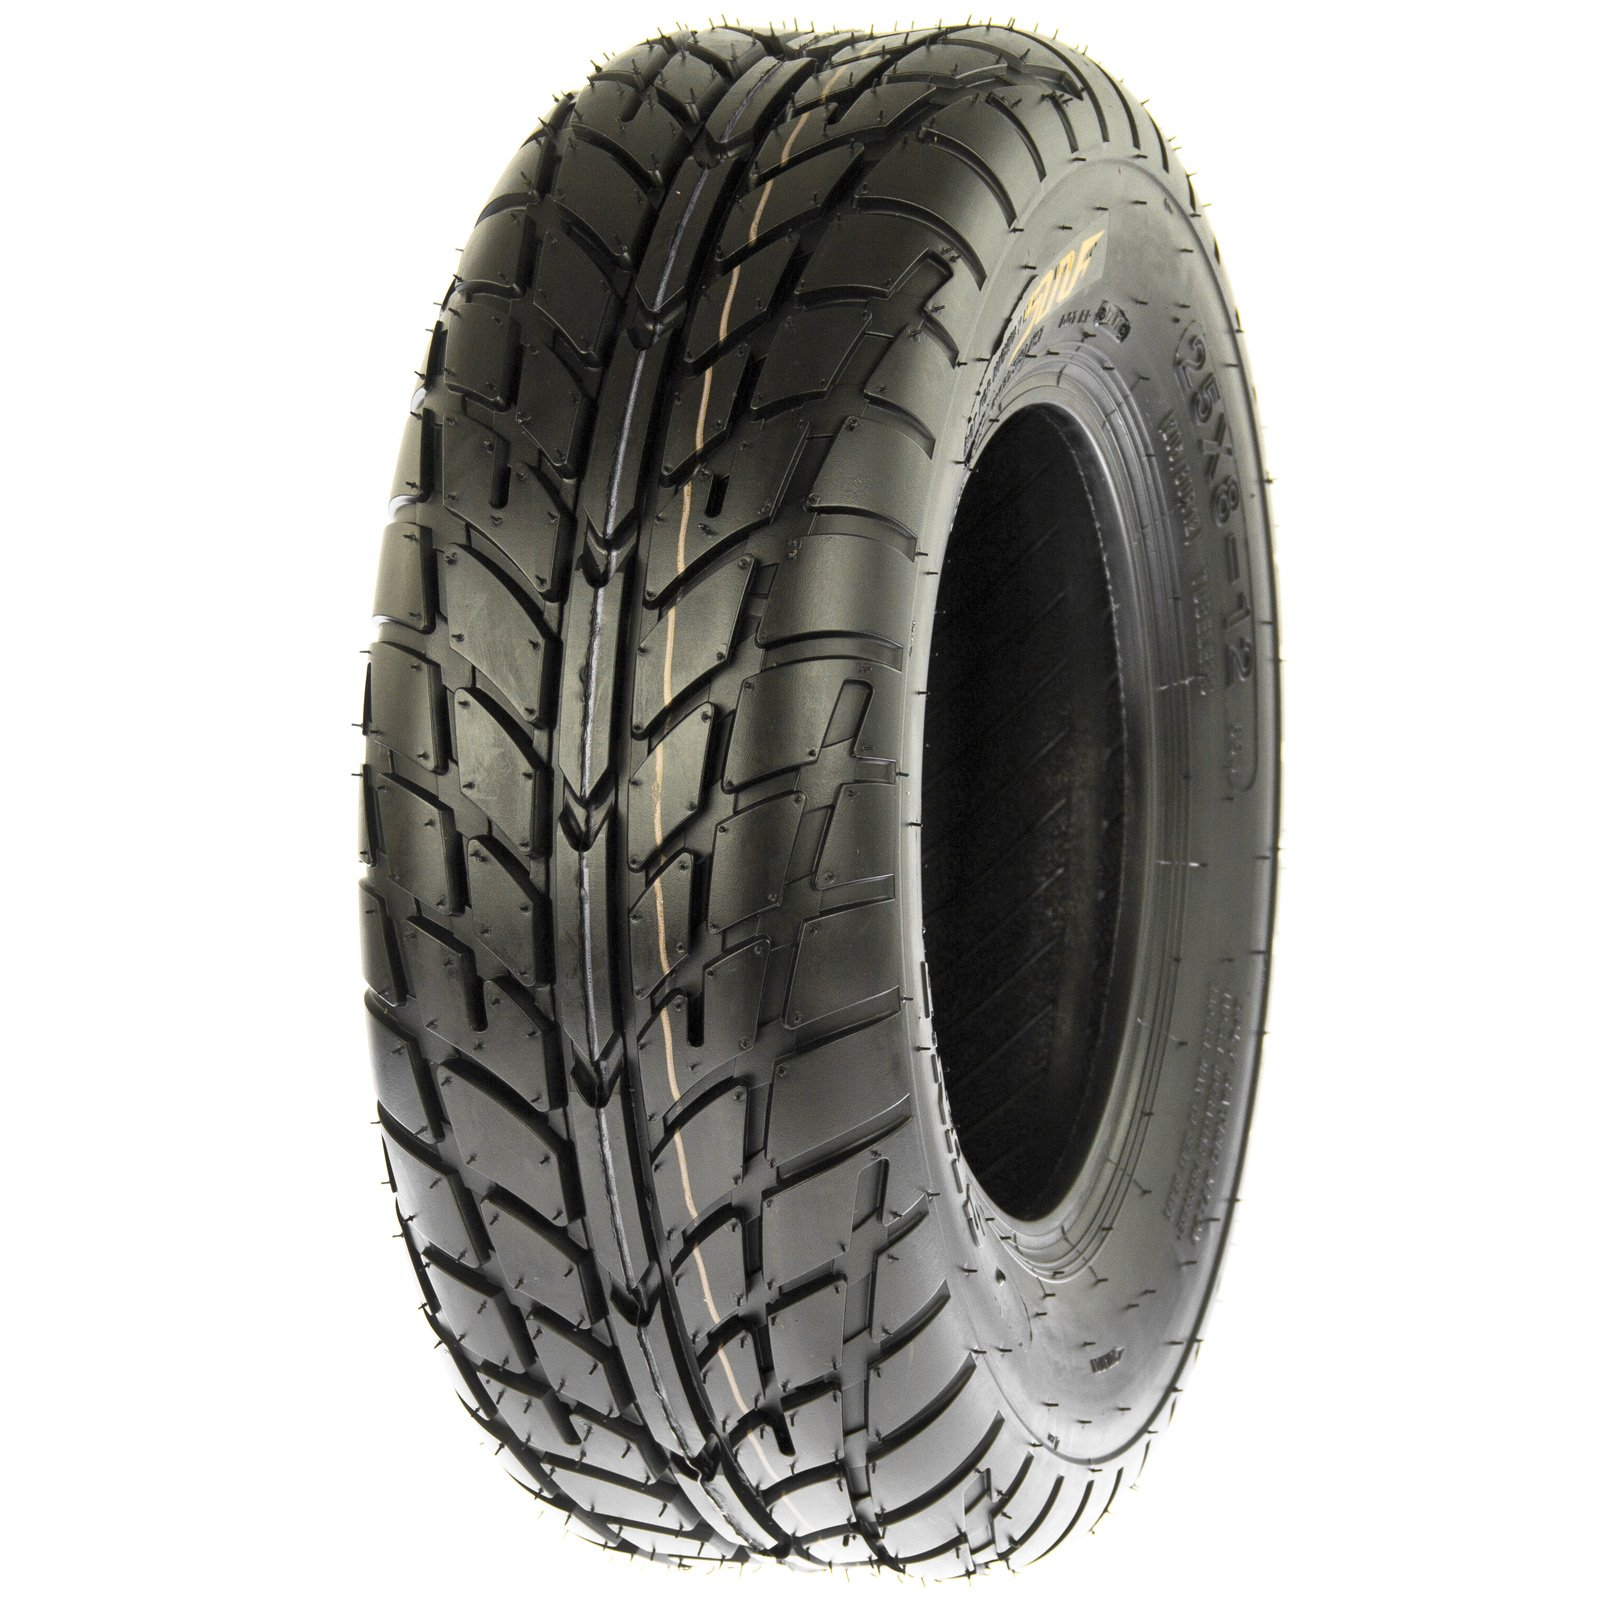 SunF Quad ATV Road Race Tires 225/45-10 225 45 10 4 PR A021 (Full set of 4) by SunF (Image #3)